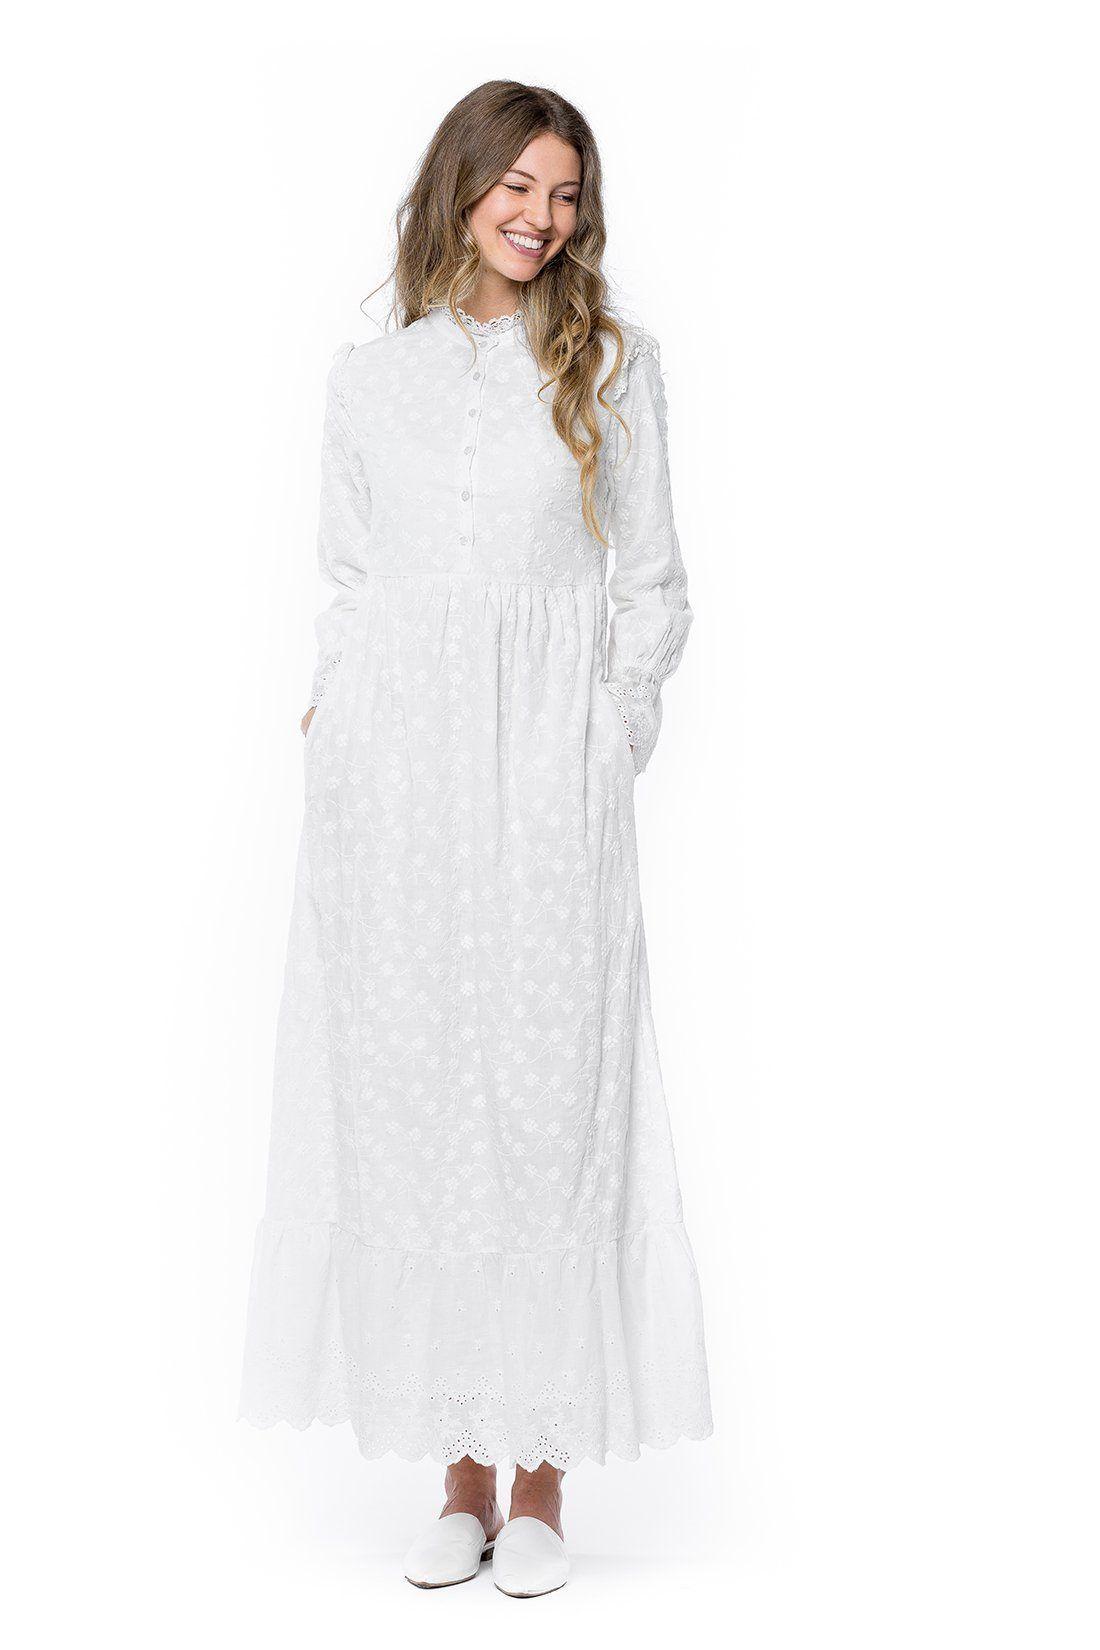 30 Stunning Temple Dresses Any Latter Day Saint Woman Would Love To Wear Temple Dress Modest White Dress Edwardian Fashion Dresses [ 1650 x 1100 Pixel ]